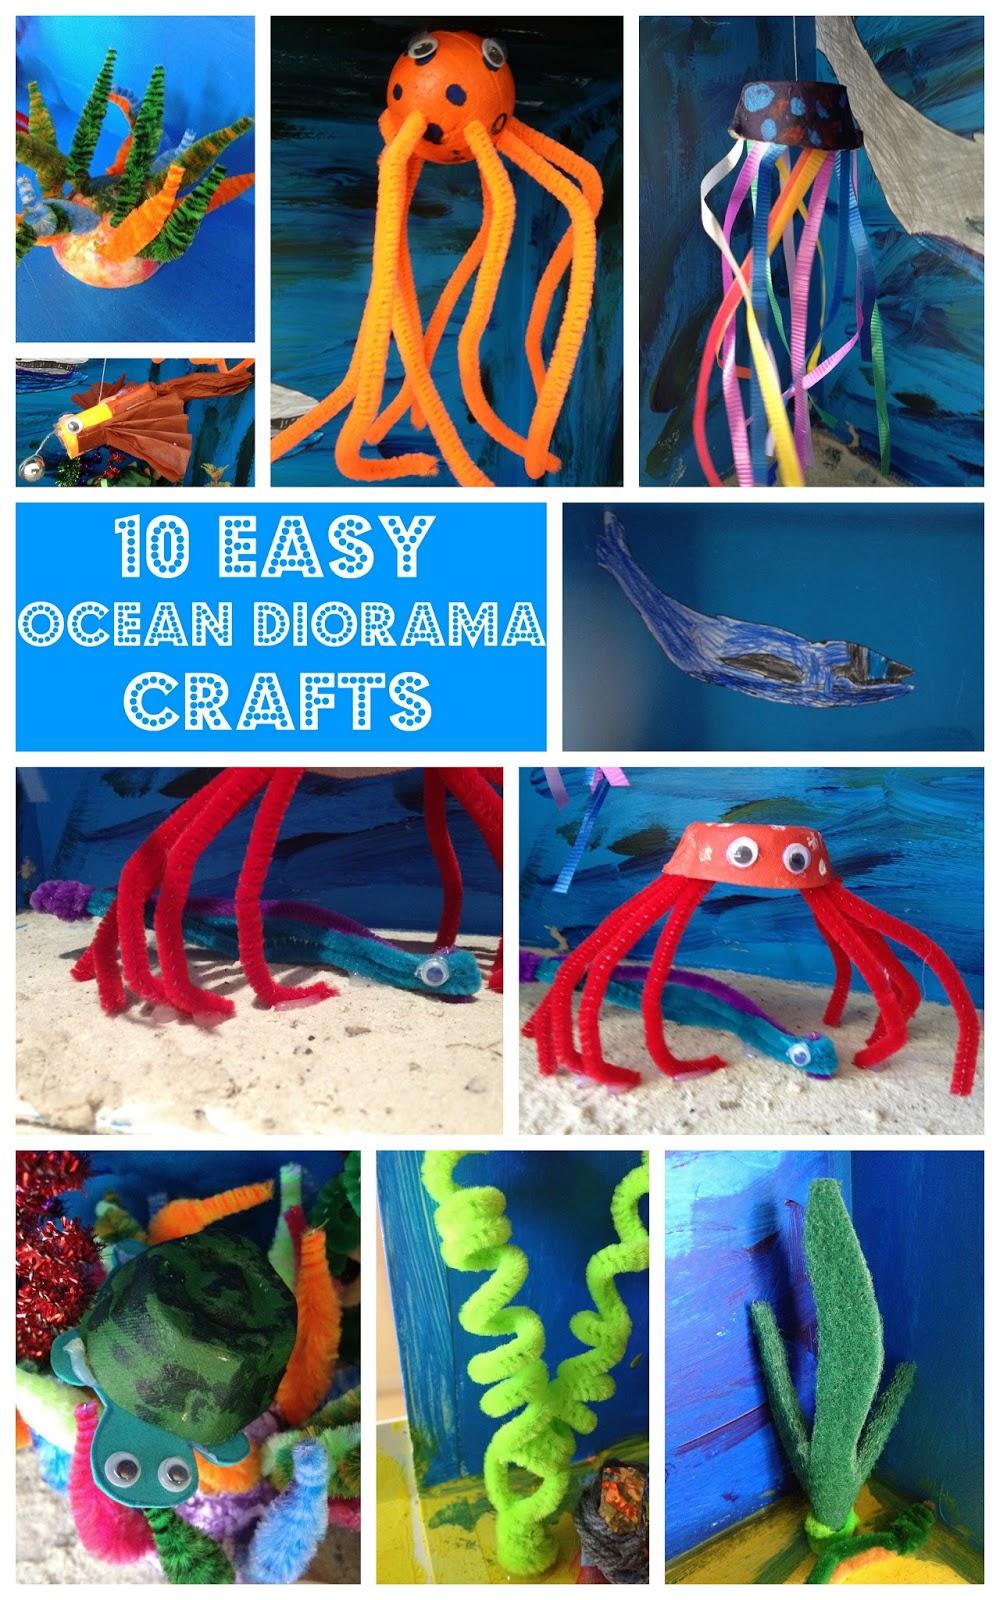 Ten Easy Ocean Diorama Crafts